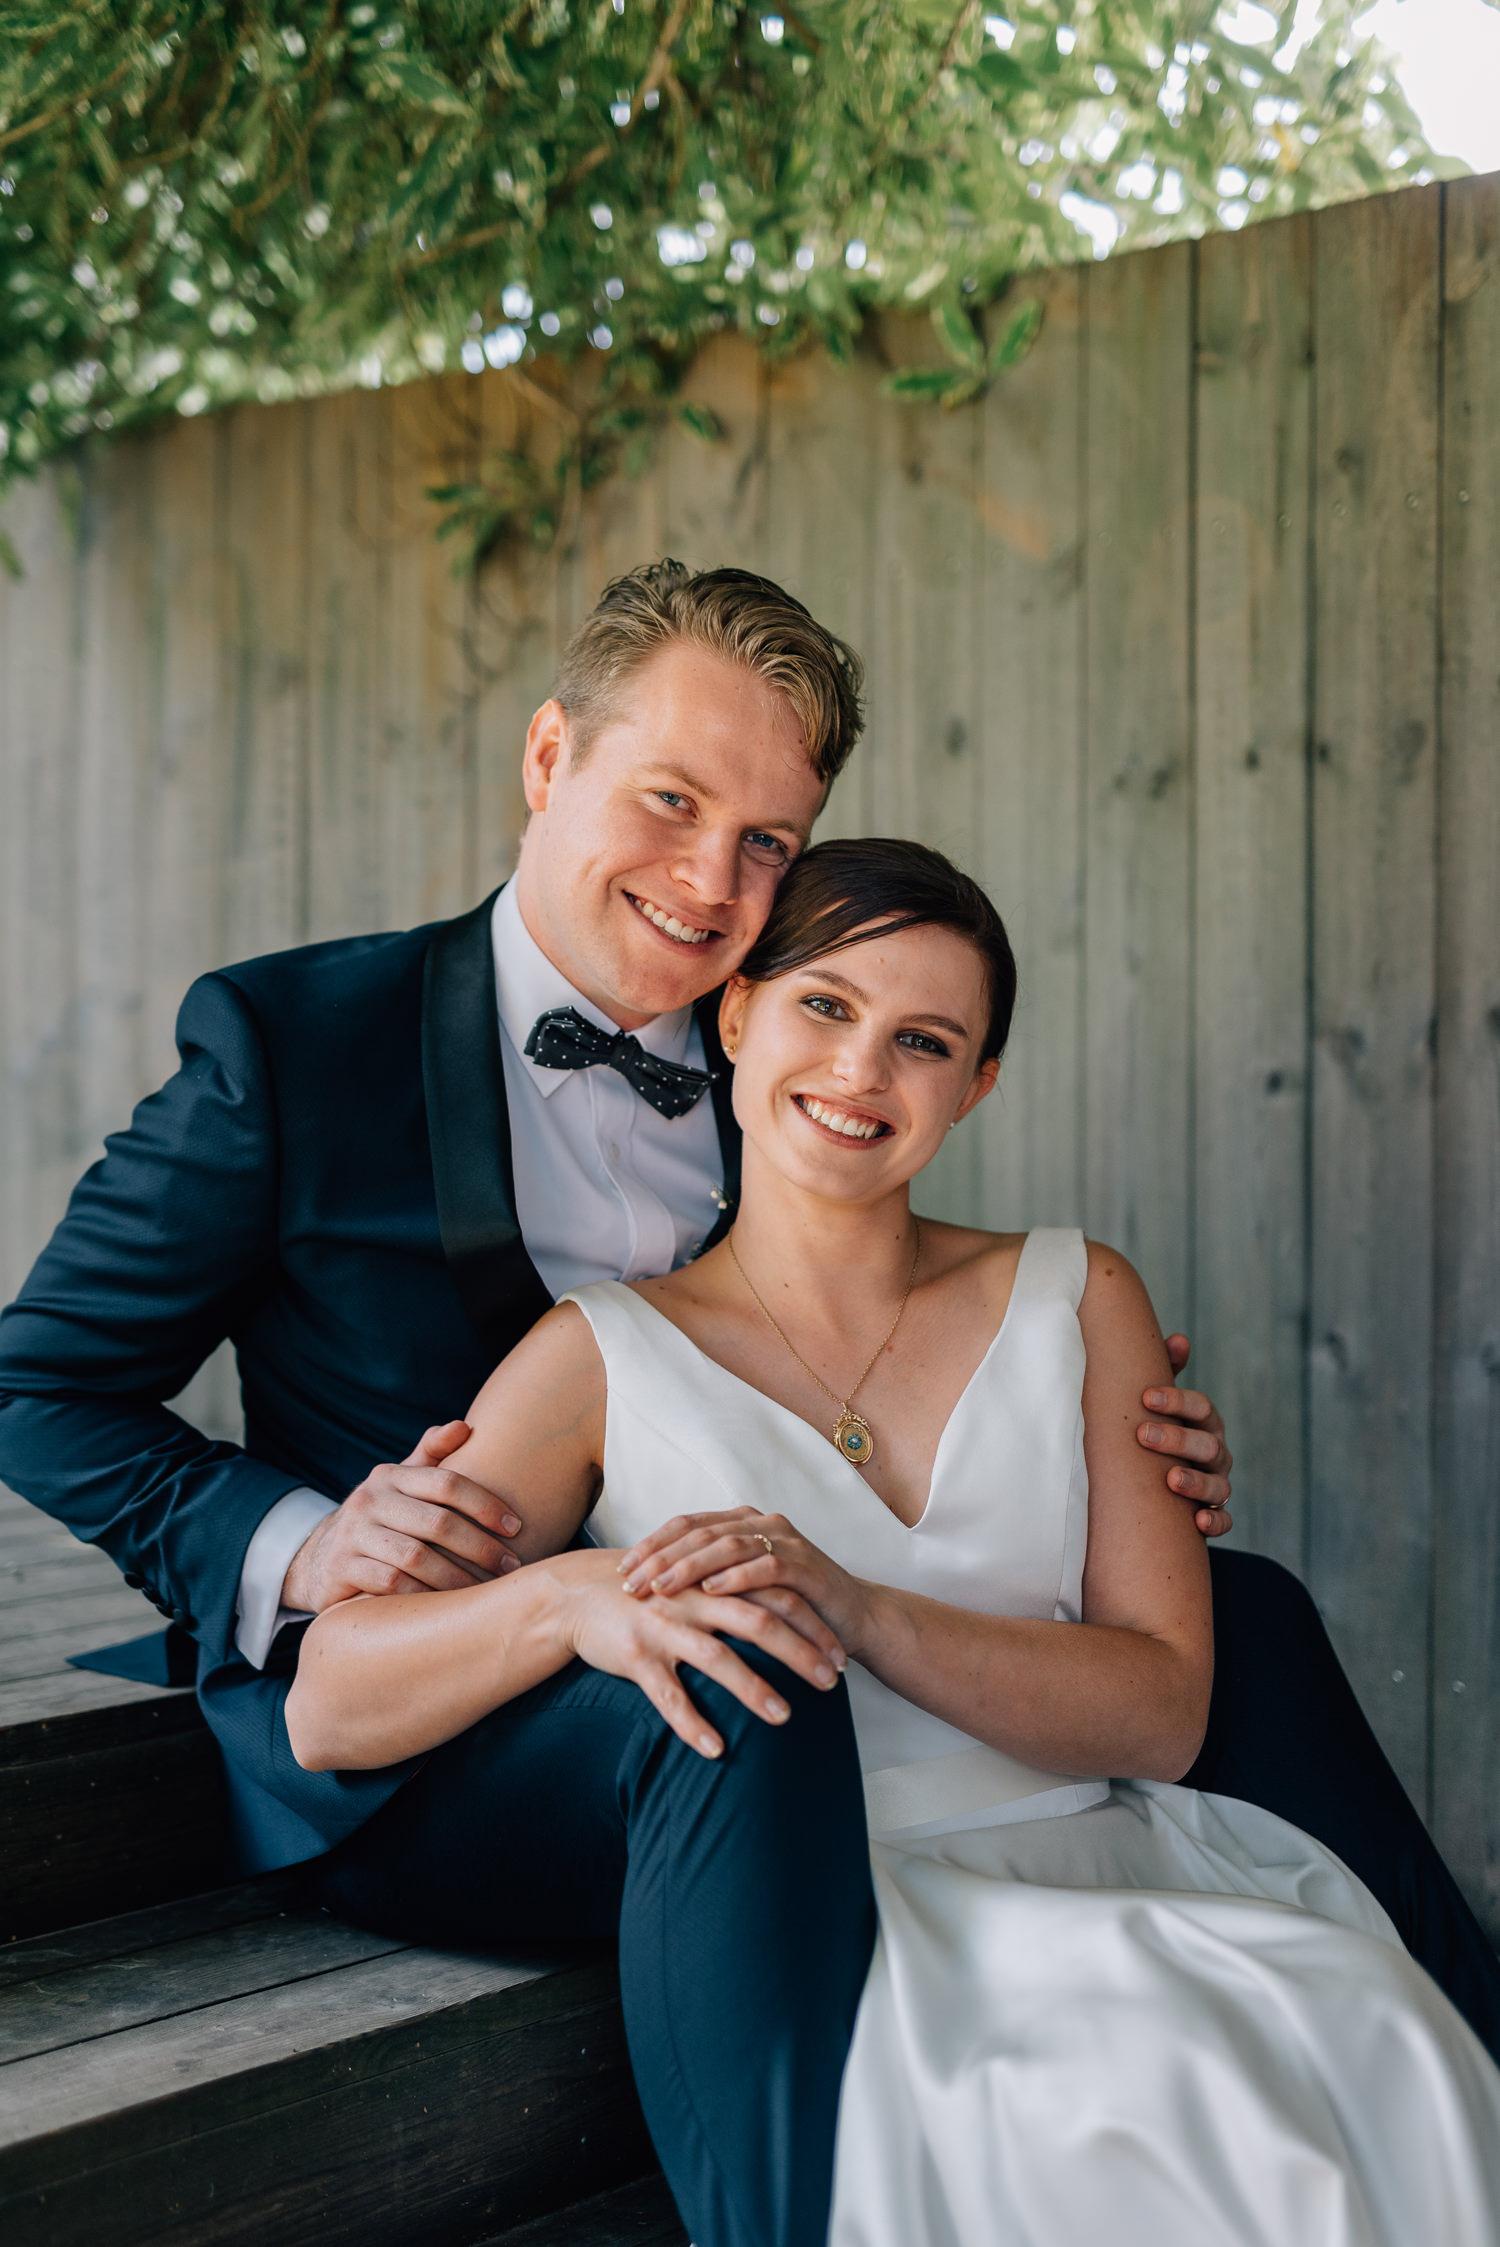 Josef-Chromy-Wedding-Photographer-75.jpg